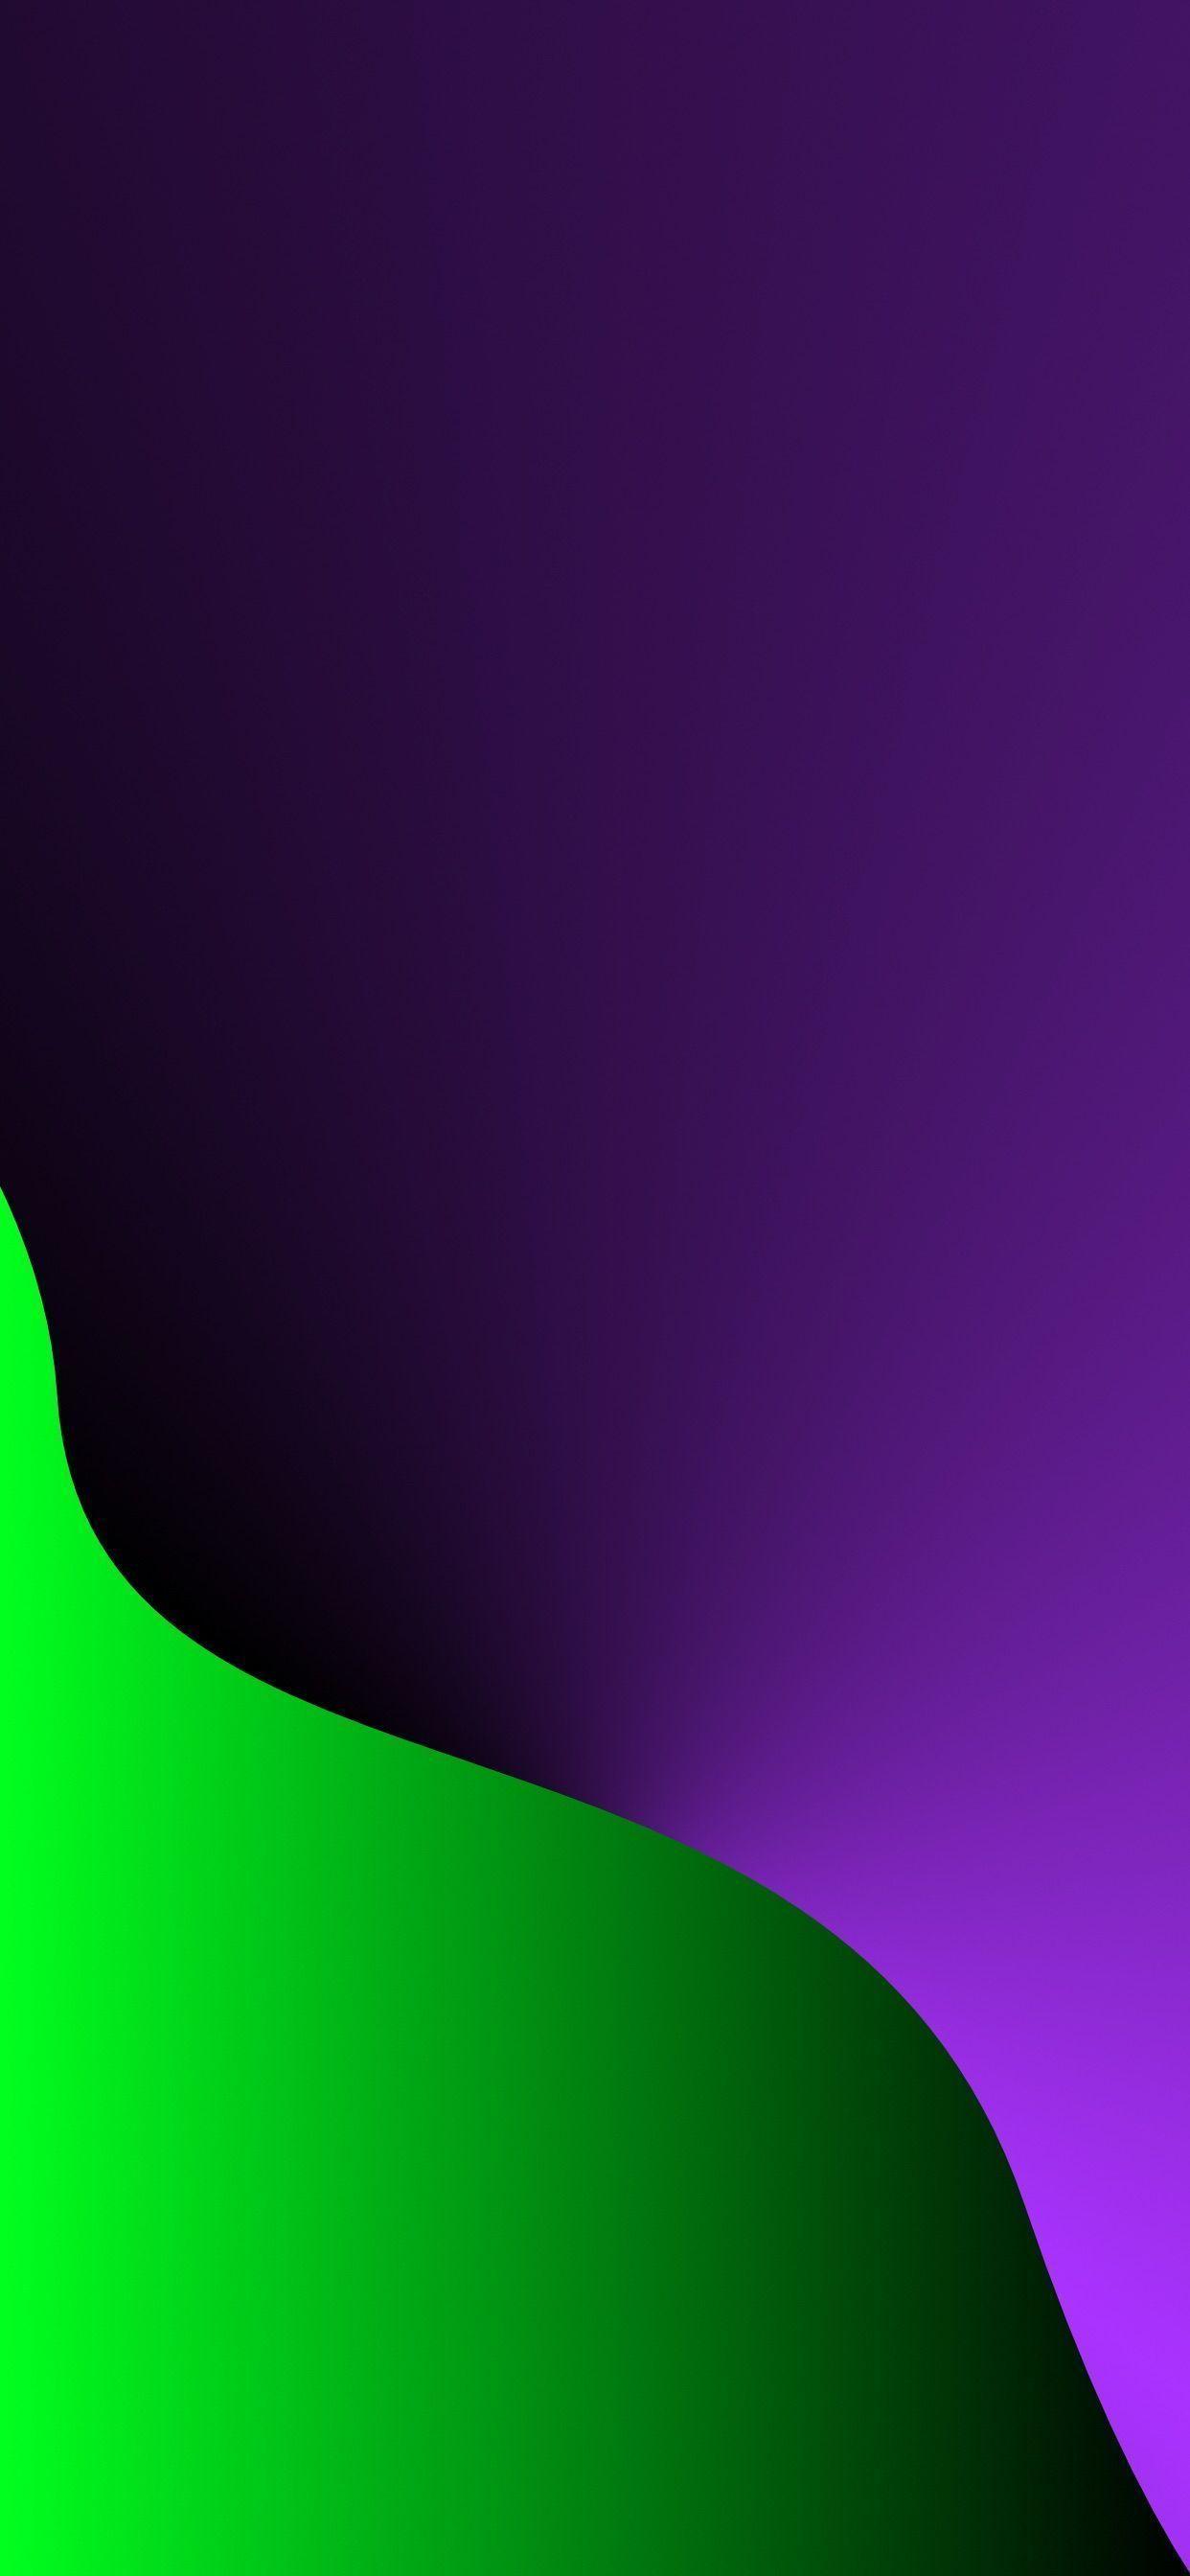 #iOS11 #iOS12 #iOS13 #Lockscreen #Homescreen #backgrounds #Apple #iPhone #iPad #iOS #wallpaper #iPhoneX #iPhoneXS #iPhoneXR #iPhoneXSMax #Mojave #Catalina #uidesign #backgrounds #Screenshot #Apple #iPhone #iPad #iOS #AndroidOS #widescreen #edge #desktop #themes #followme #background #follow #random #xs #xsmax #design #wallpapers #oled #amoled #wwdc #android #checkm8 #checkrain #checkra1n #ios13wallpaper #iOS11 #iOS12 #iOS13 #Lockscreen #Homescreen #backgrounds #Apple #iPhone #iPad #iOS #wallpape #ios13wallpaper